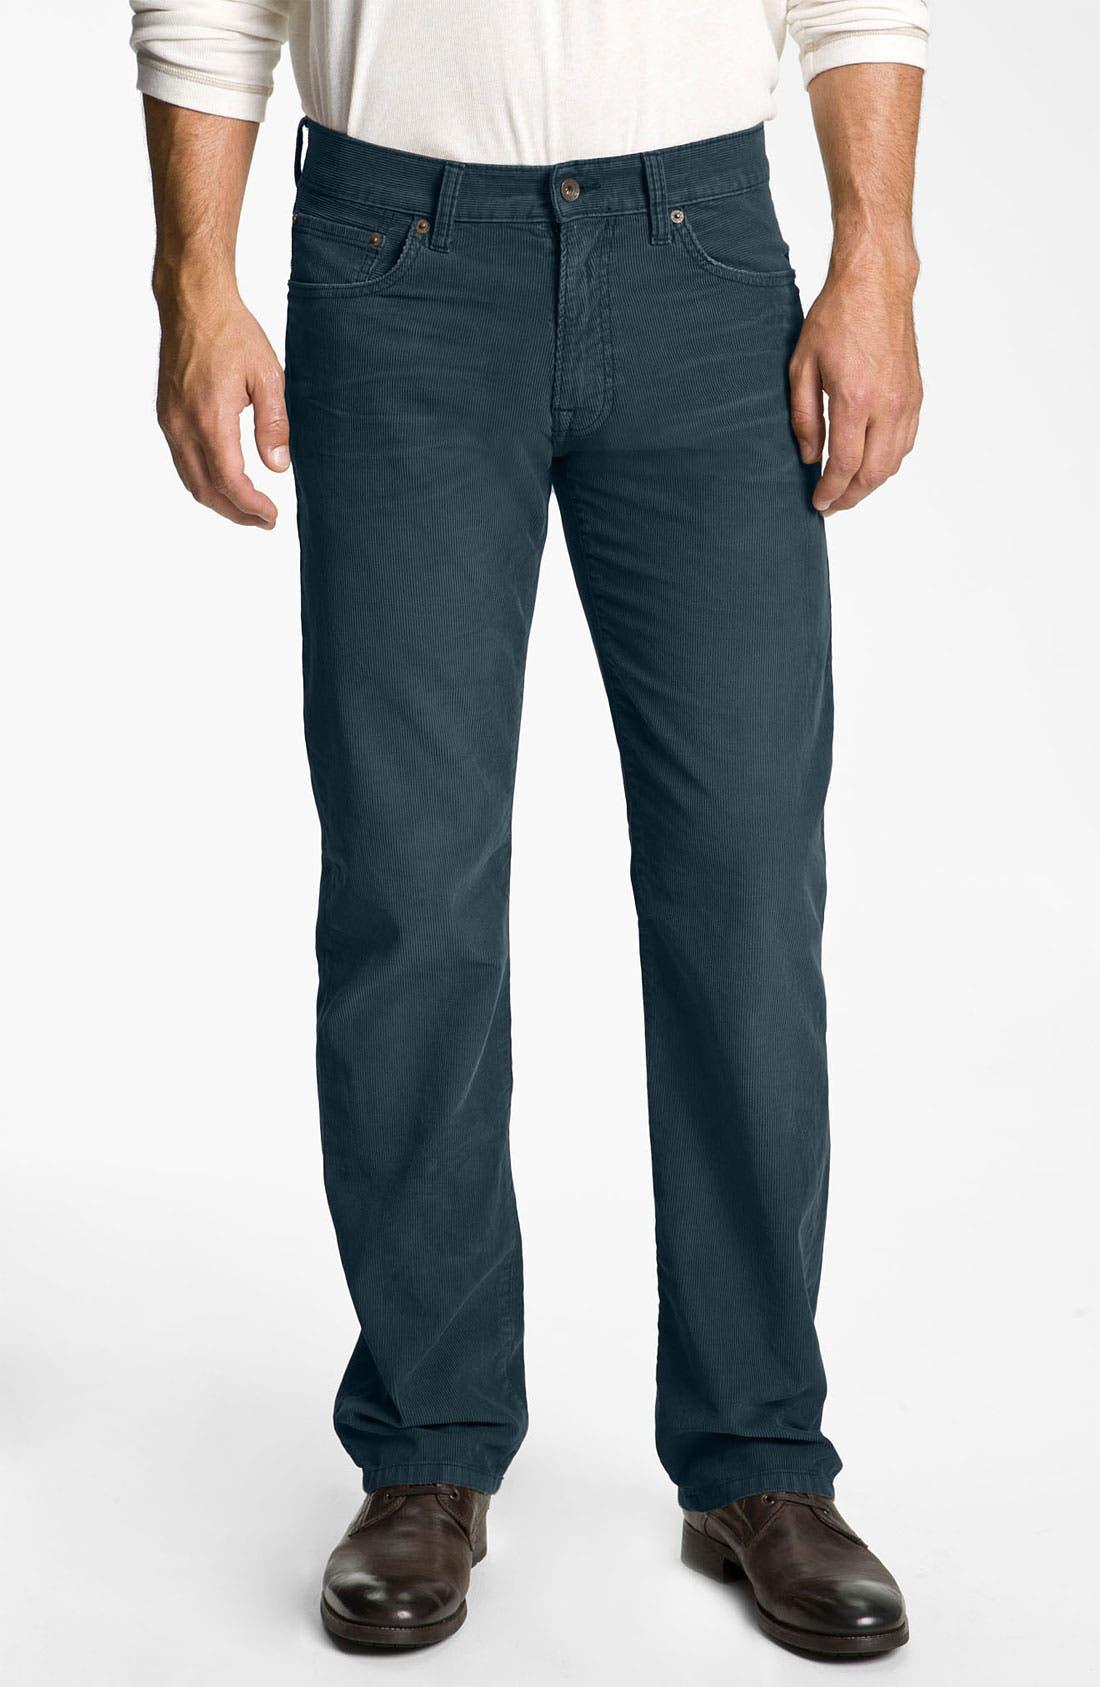 Alternate Image 1 Selected - Lucky Brand '221 Original' Straight Leg Corduroy Pants